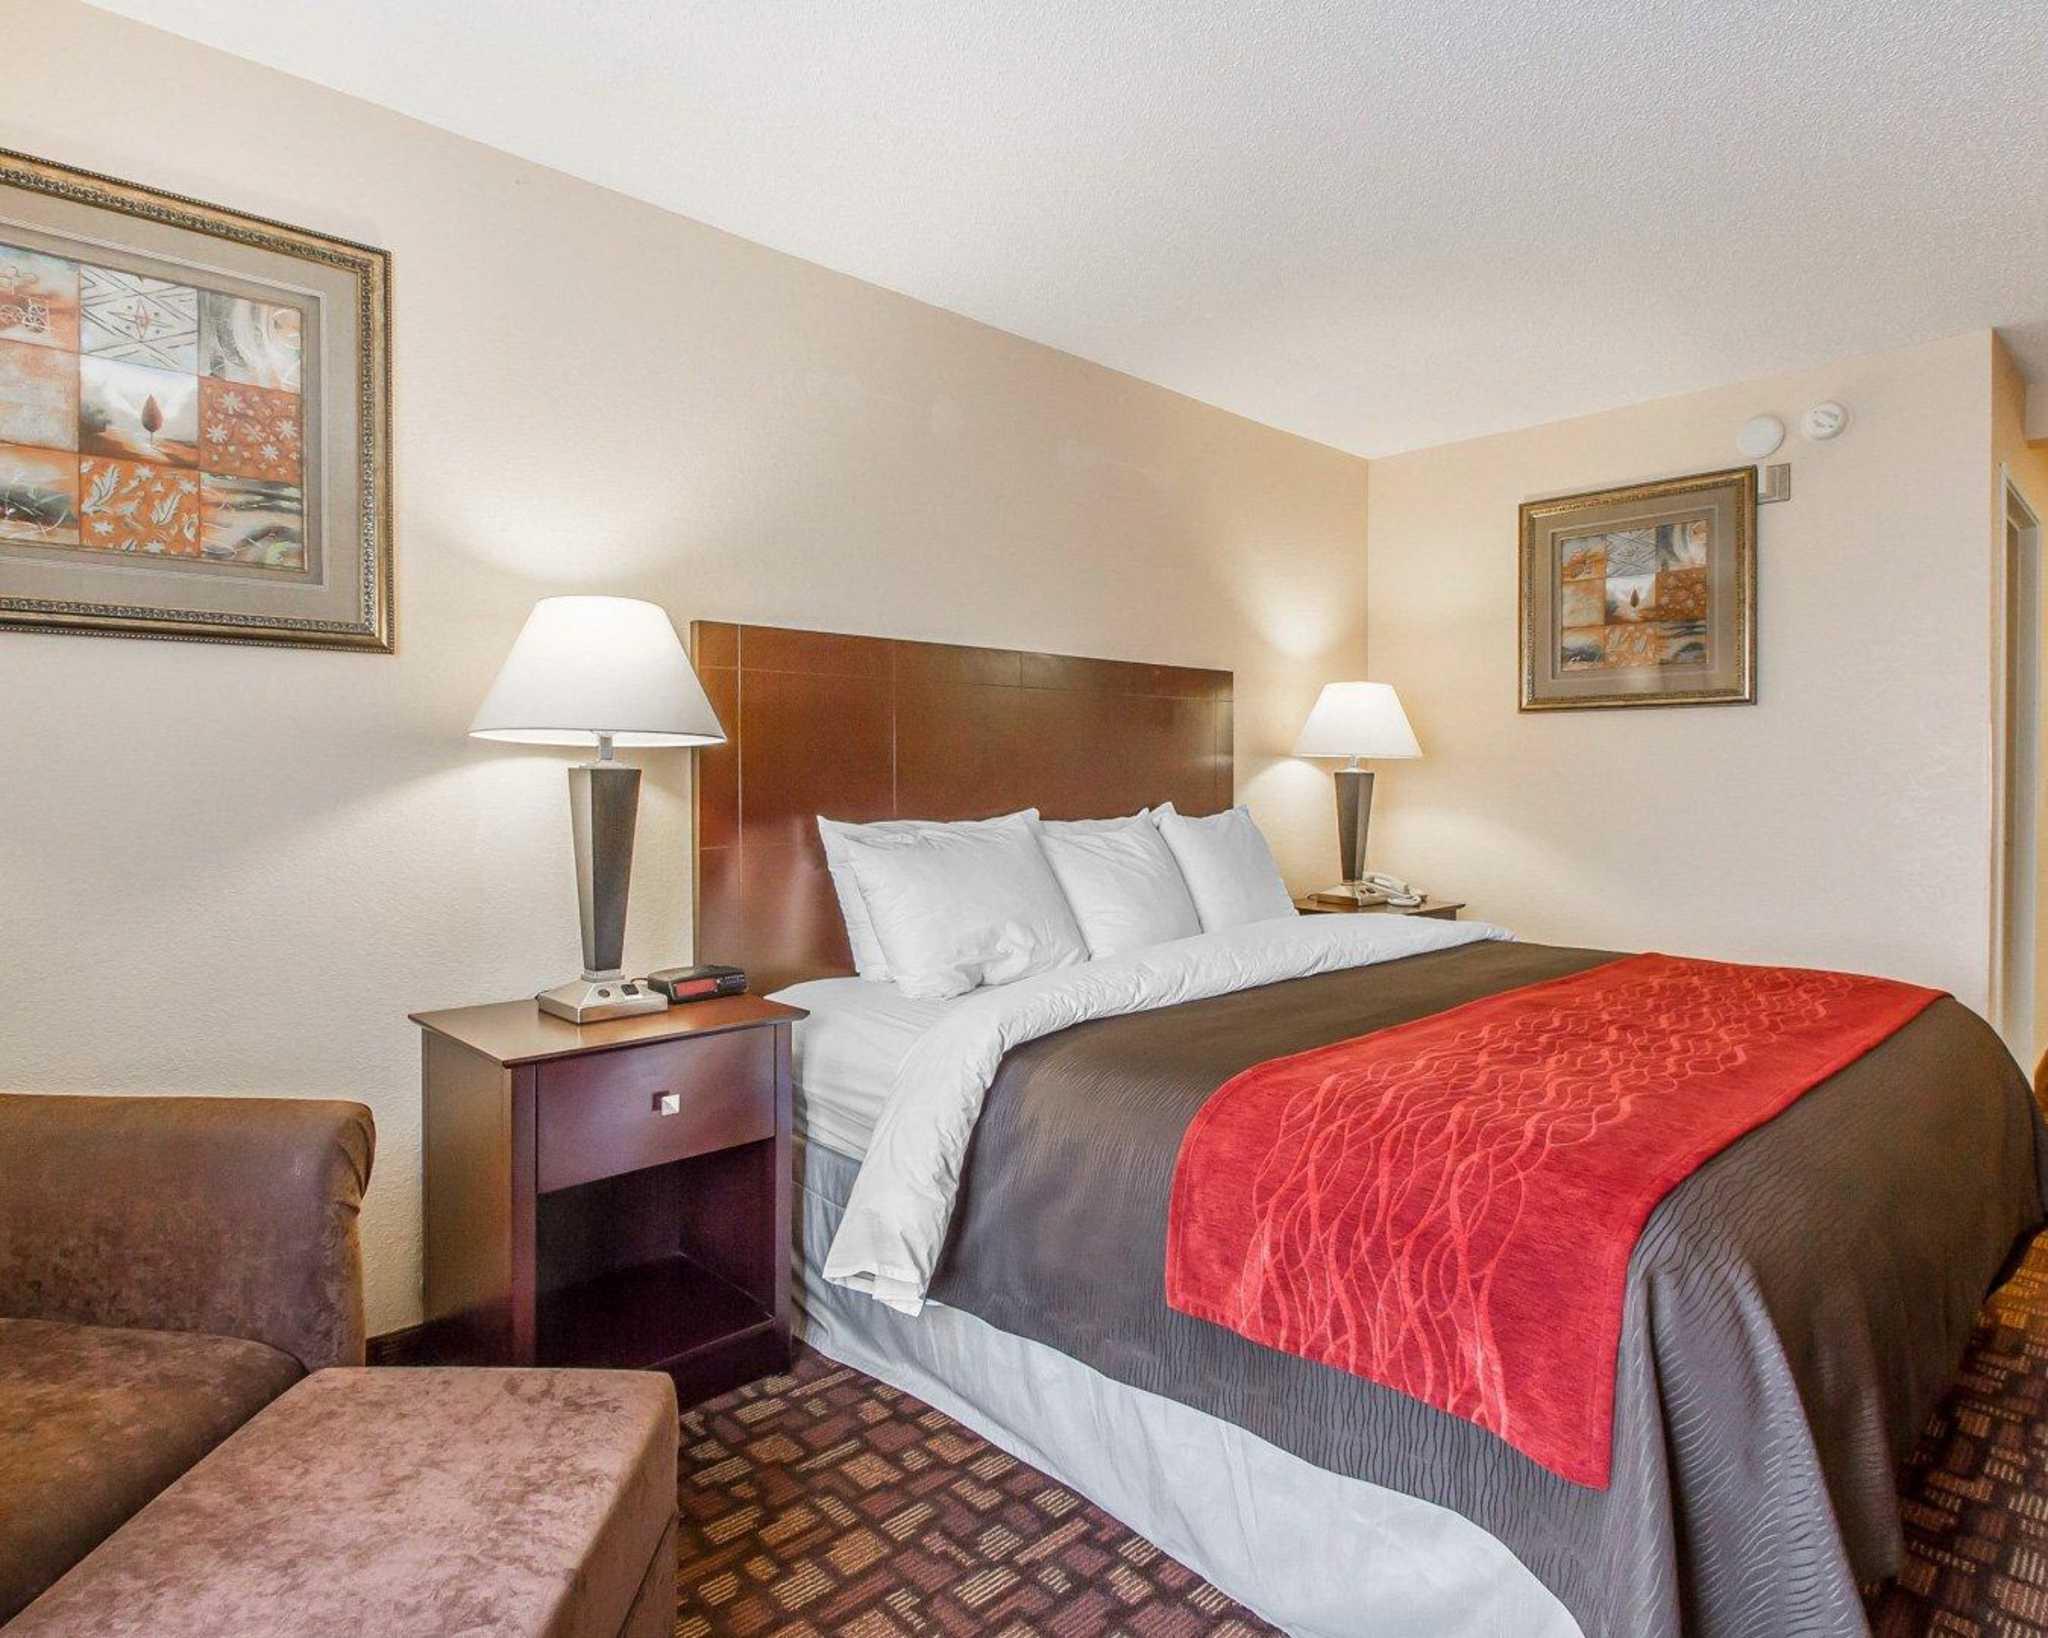 Comfort Inn Amp Suites Tucson Az Www Choicehotels Com